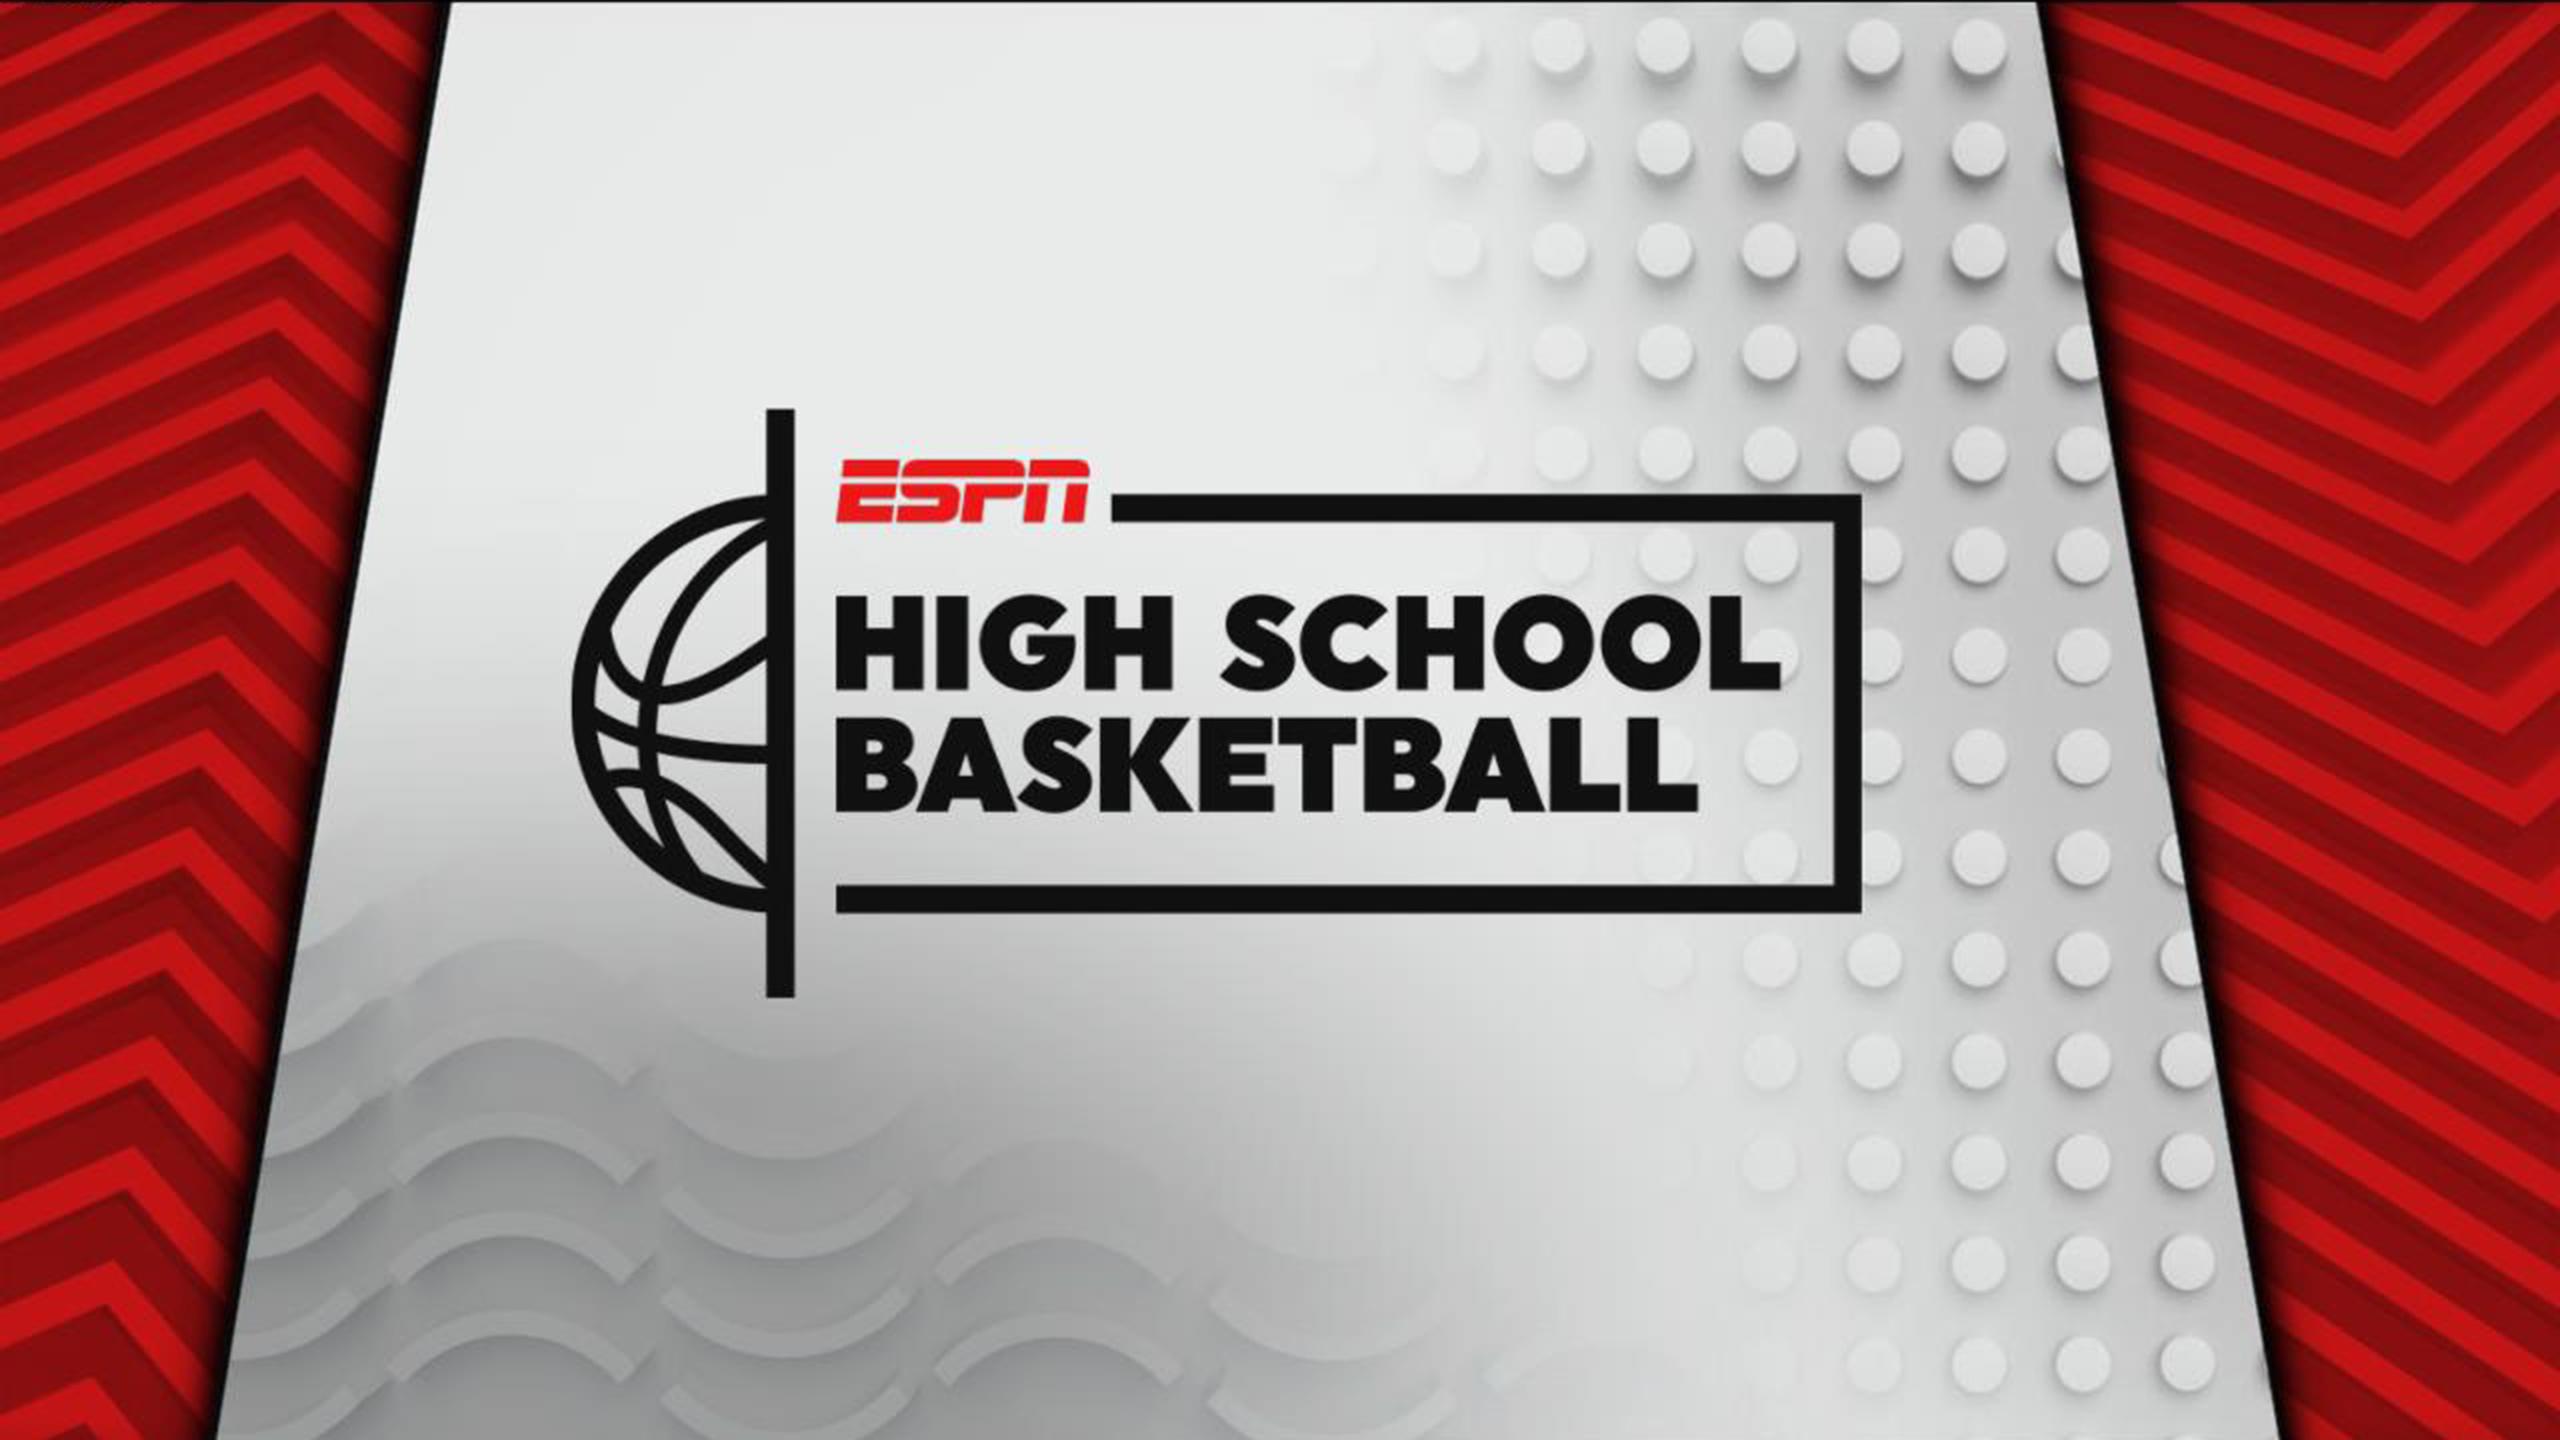 Federal Way (WA) vs. Ranney (NJ) (Boys' HS Basketball)